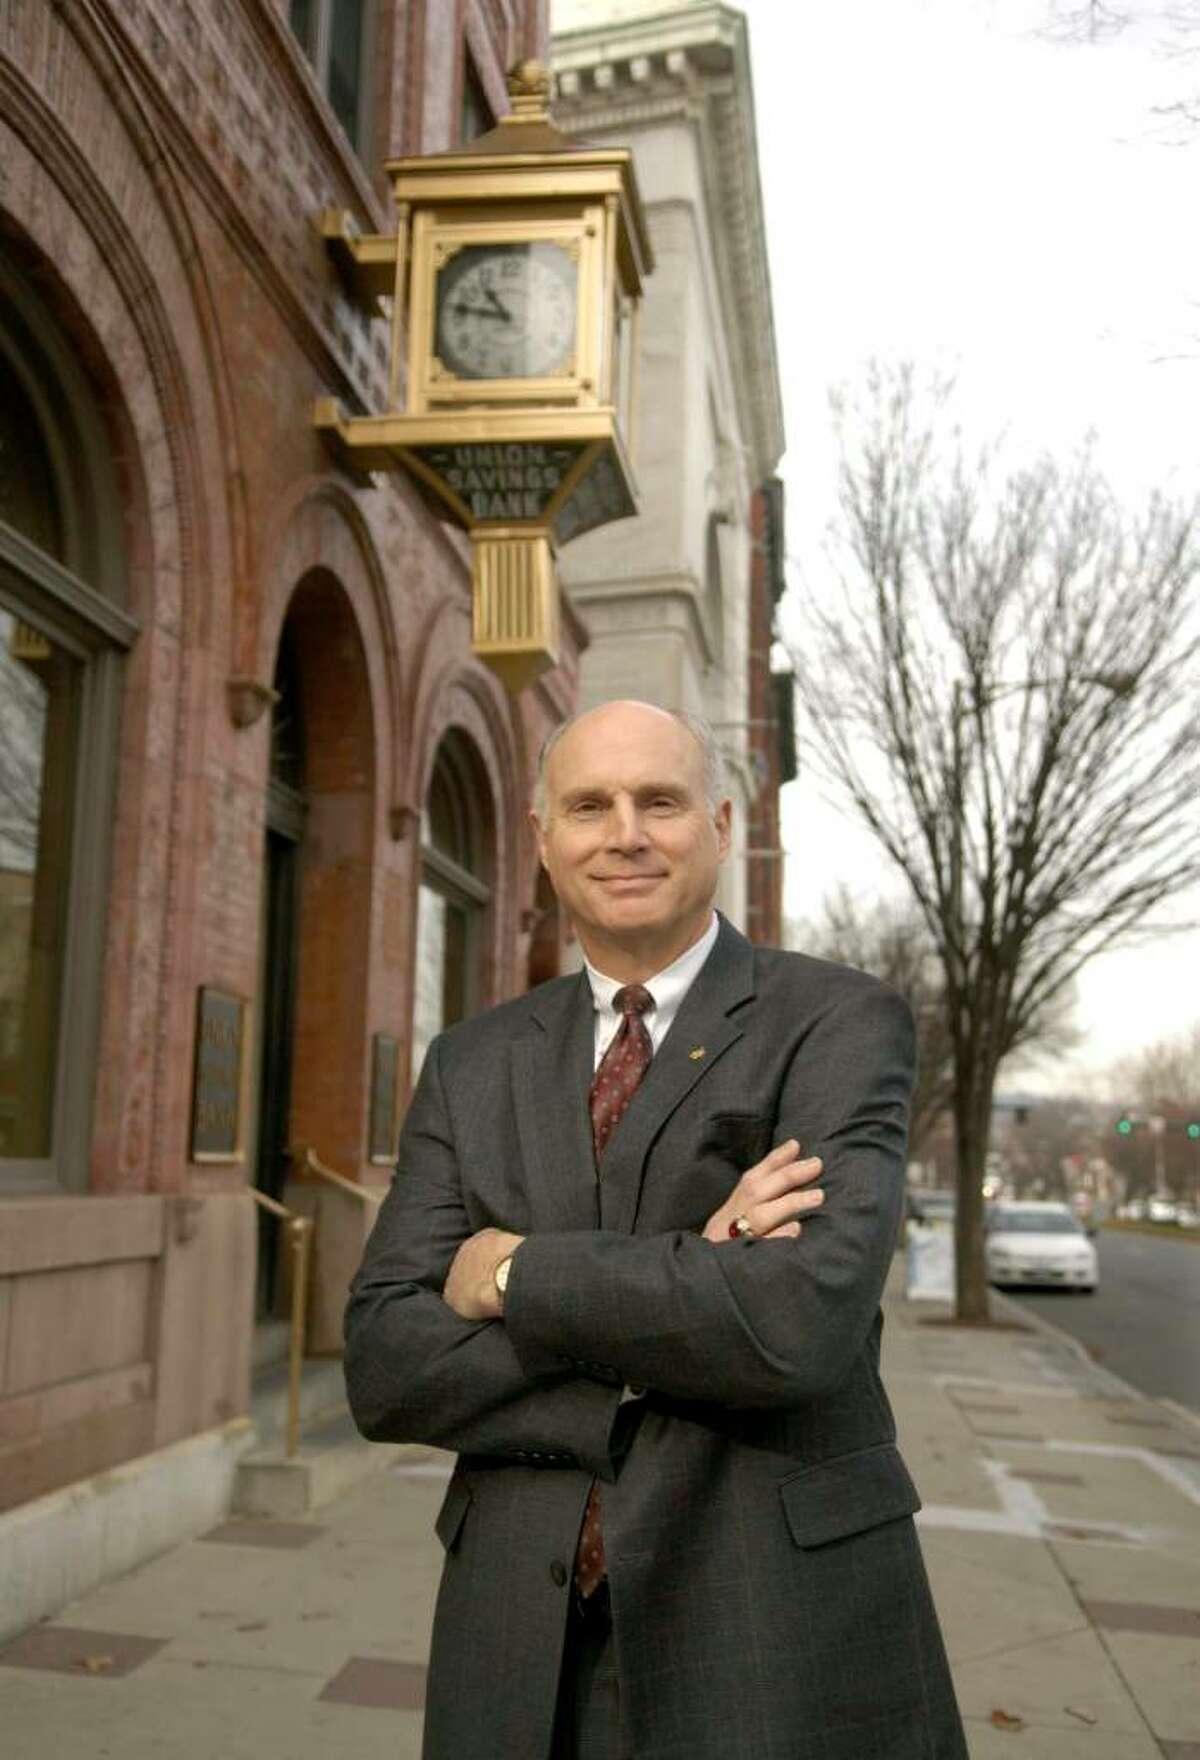 John Kline the President and CEO of Union Savings Bank on Main St Danbury